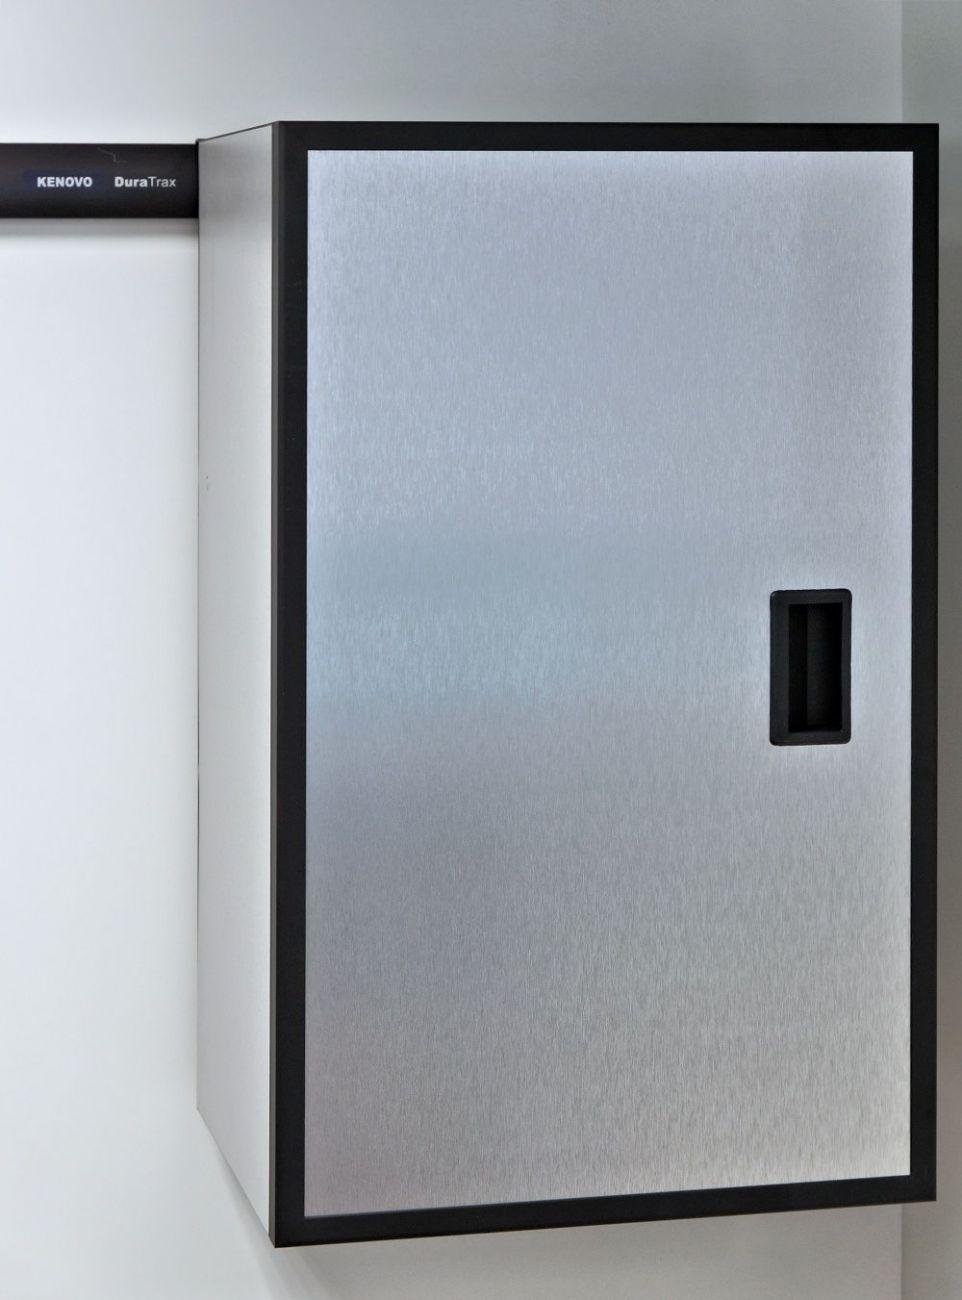 CX-C731  Шкаф навесной одностворчатый 720x450x320. Cosmi-X